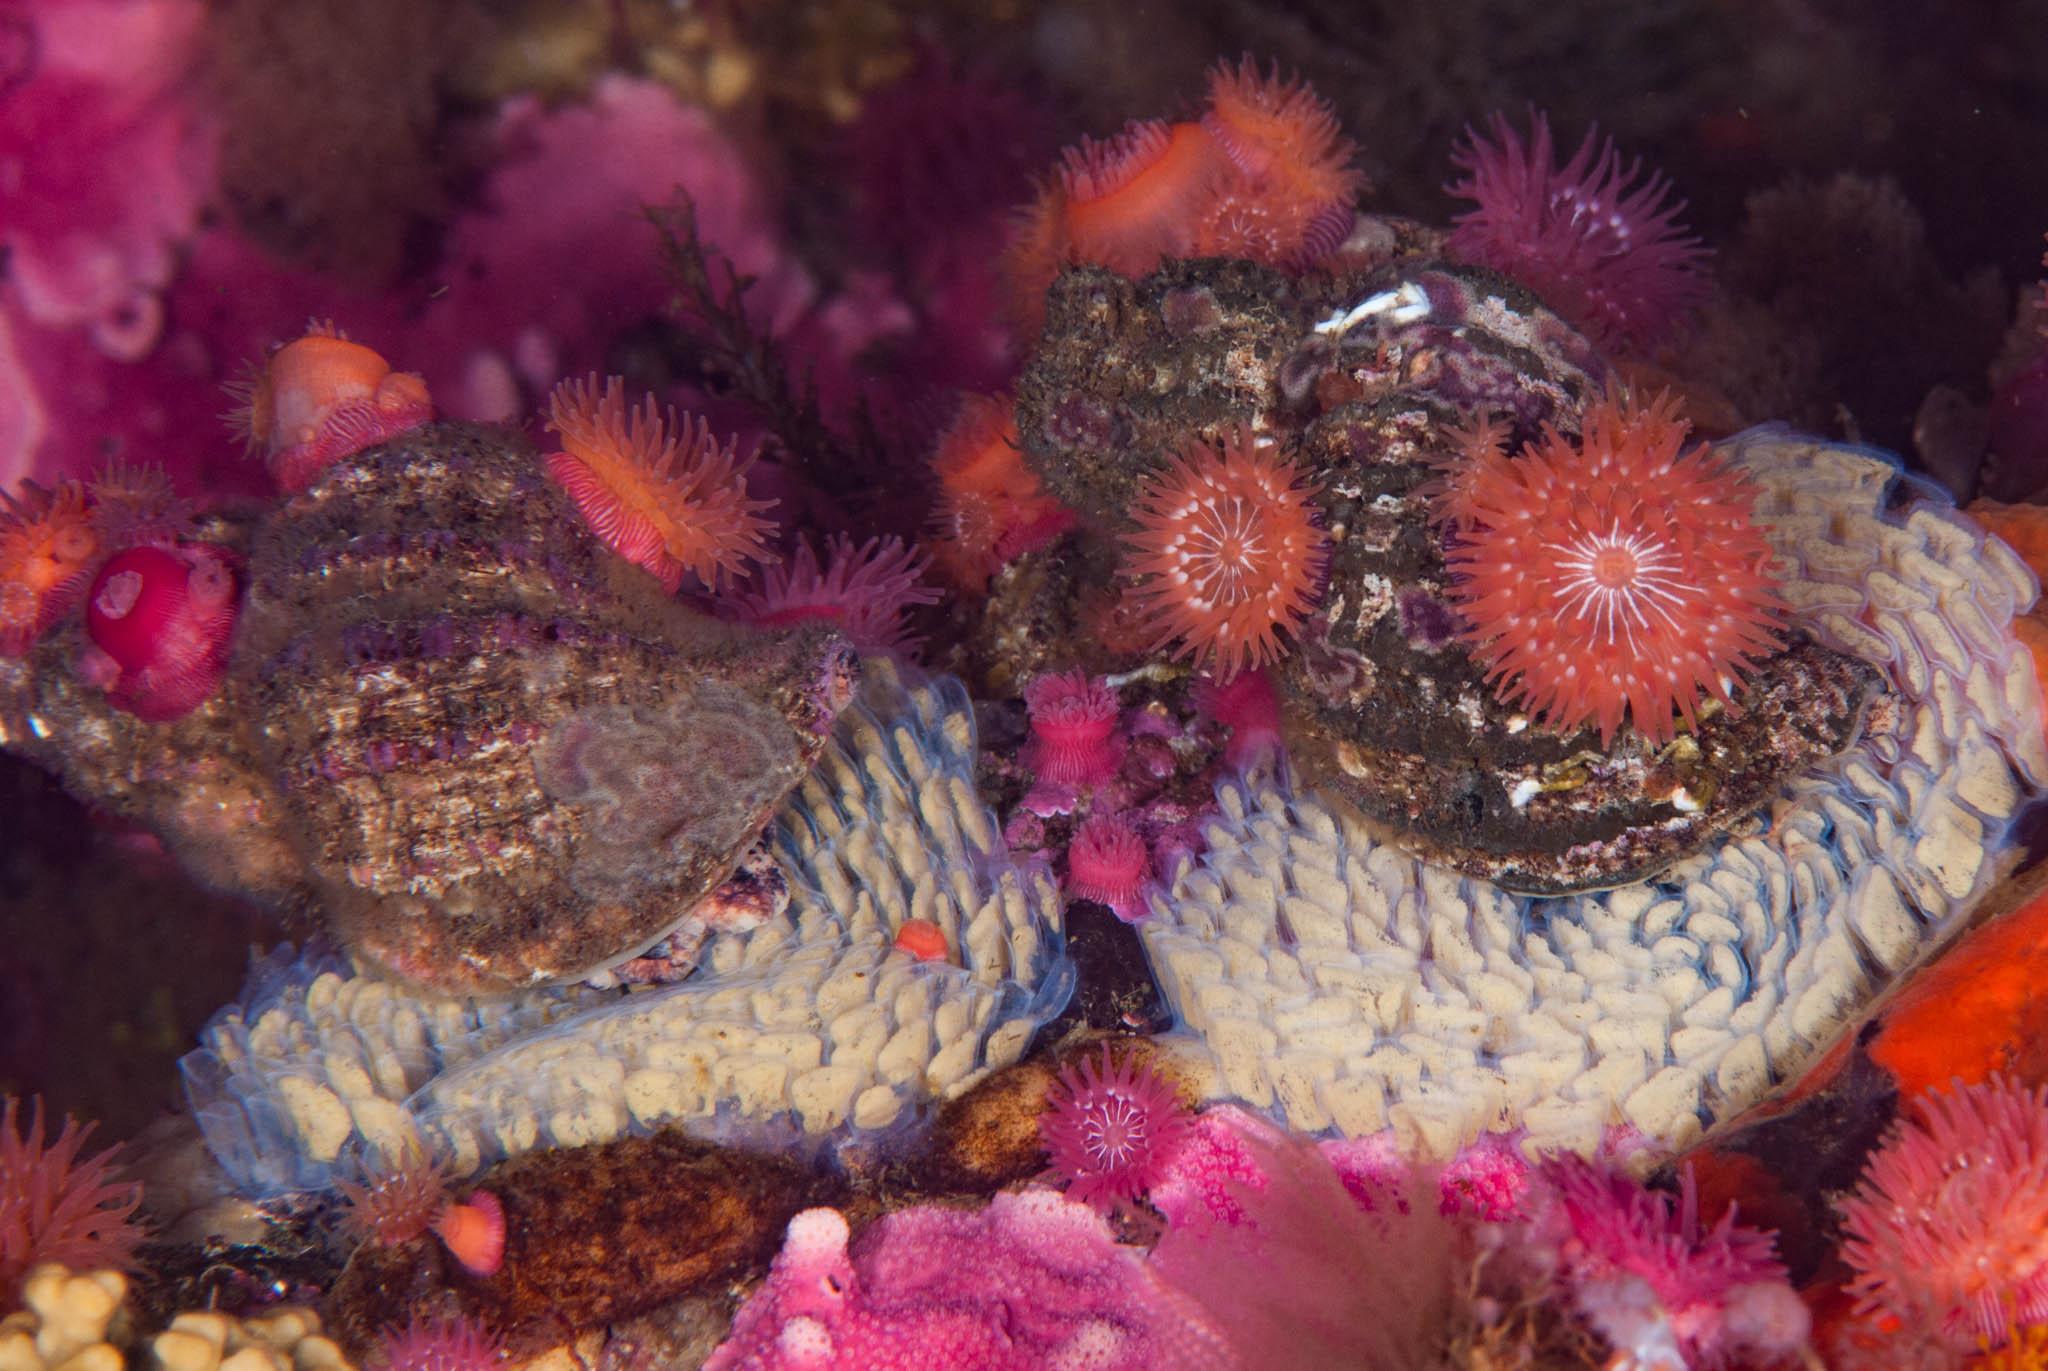 Fusitriton oregonensis